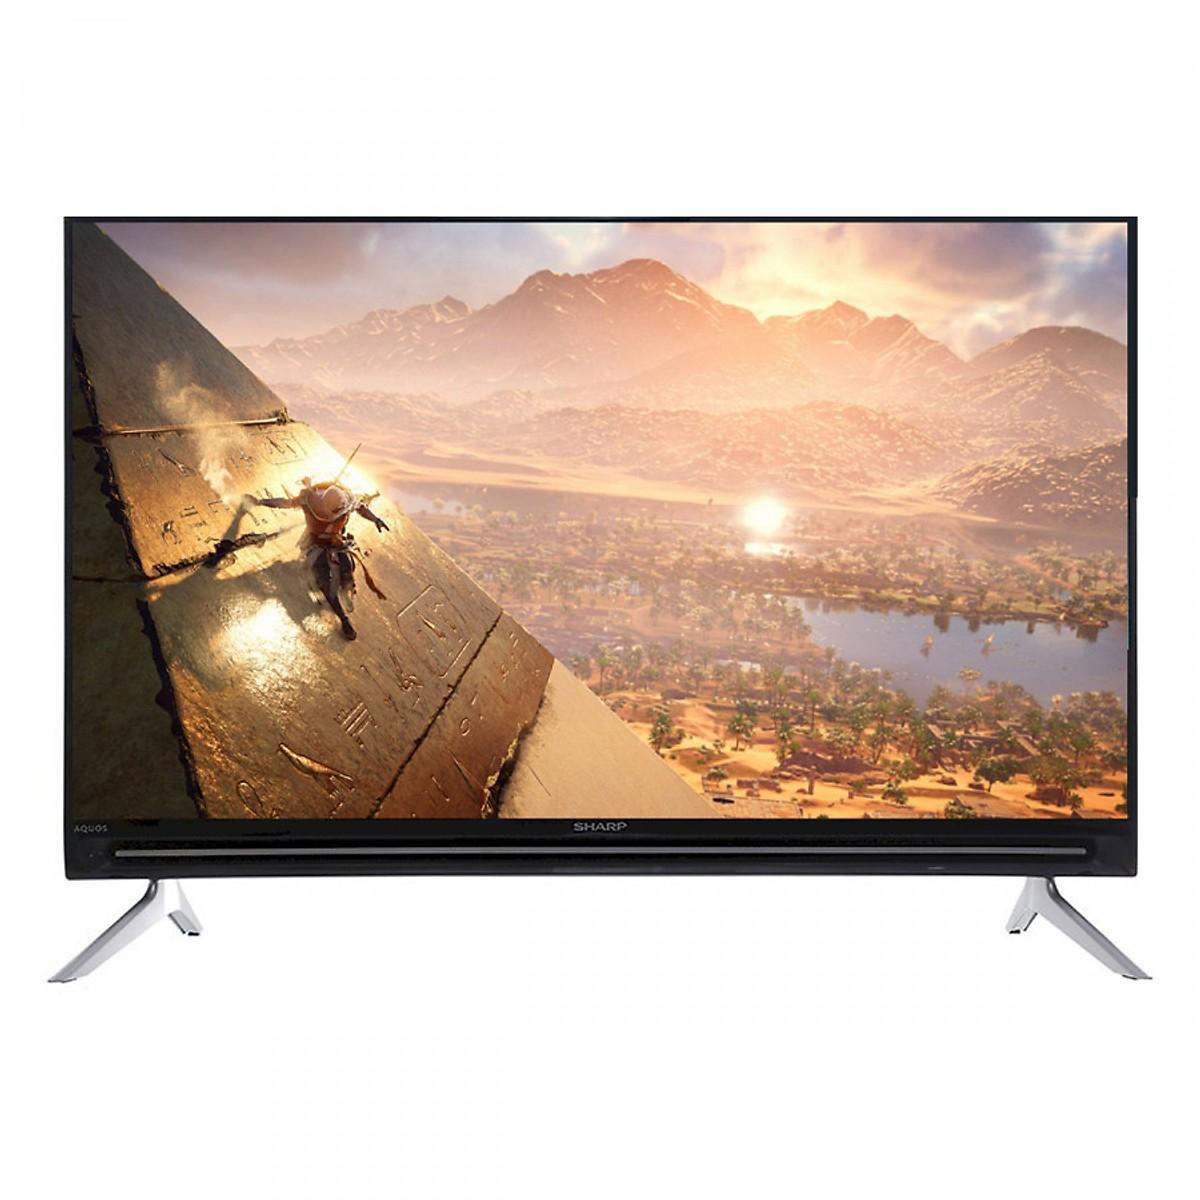 Internet Tivi Sharp 40 inch Full HD LC-40SA5500X